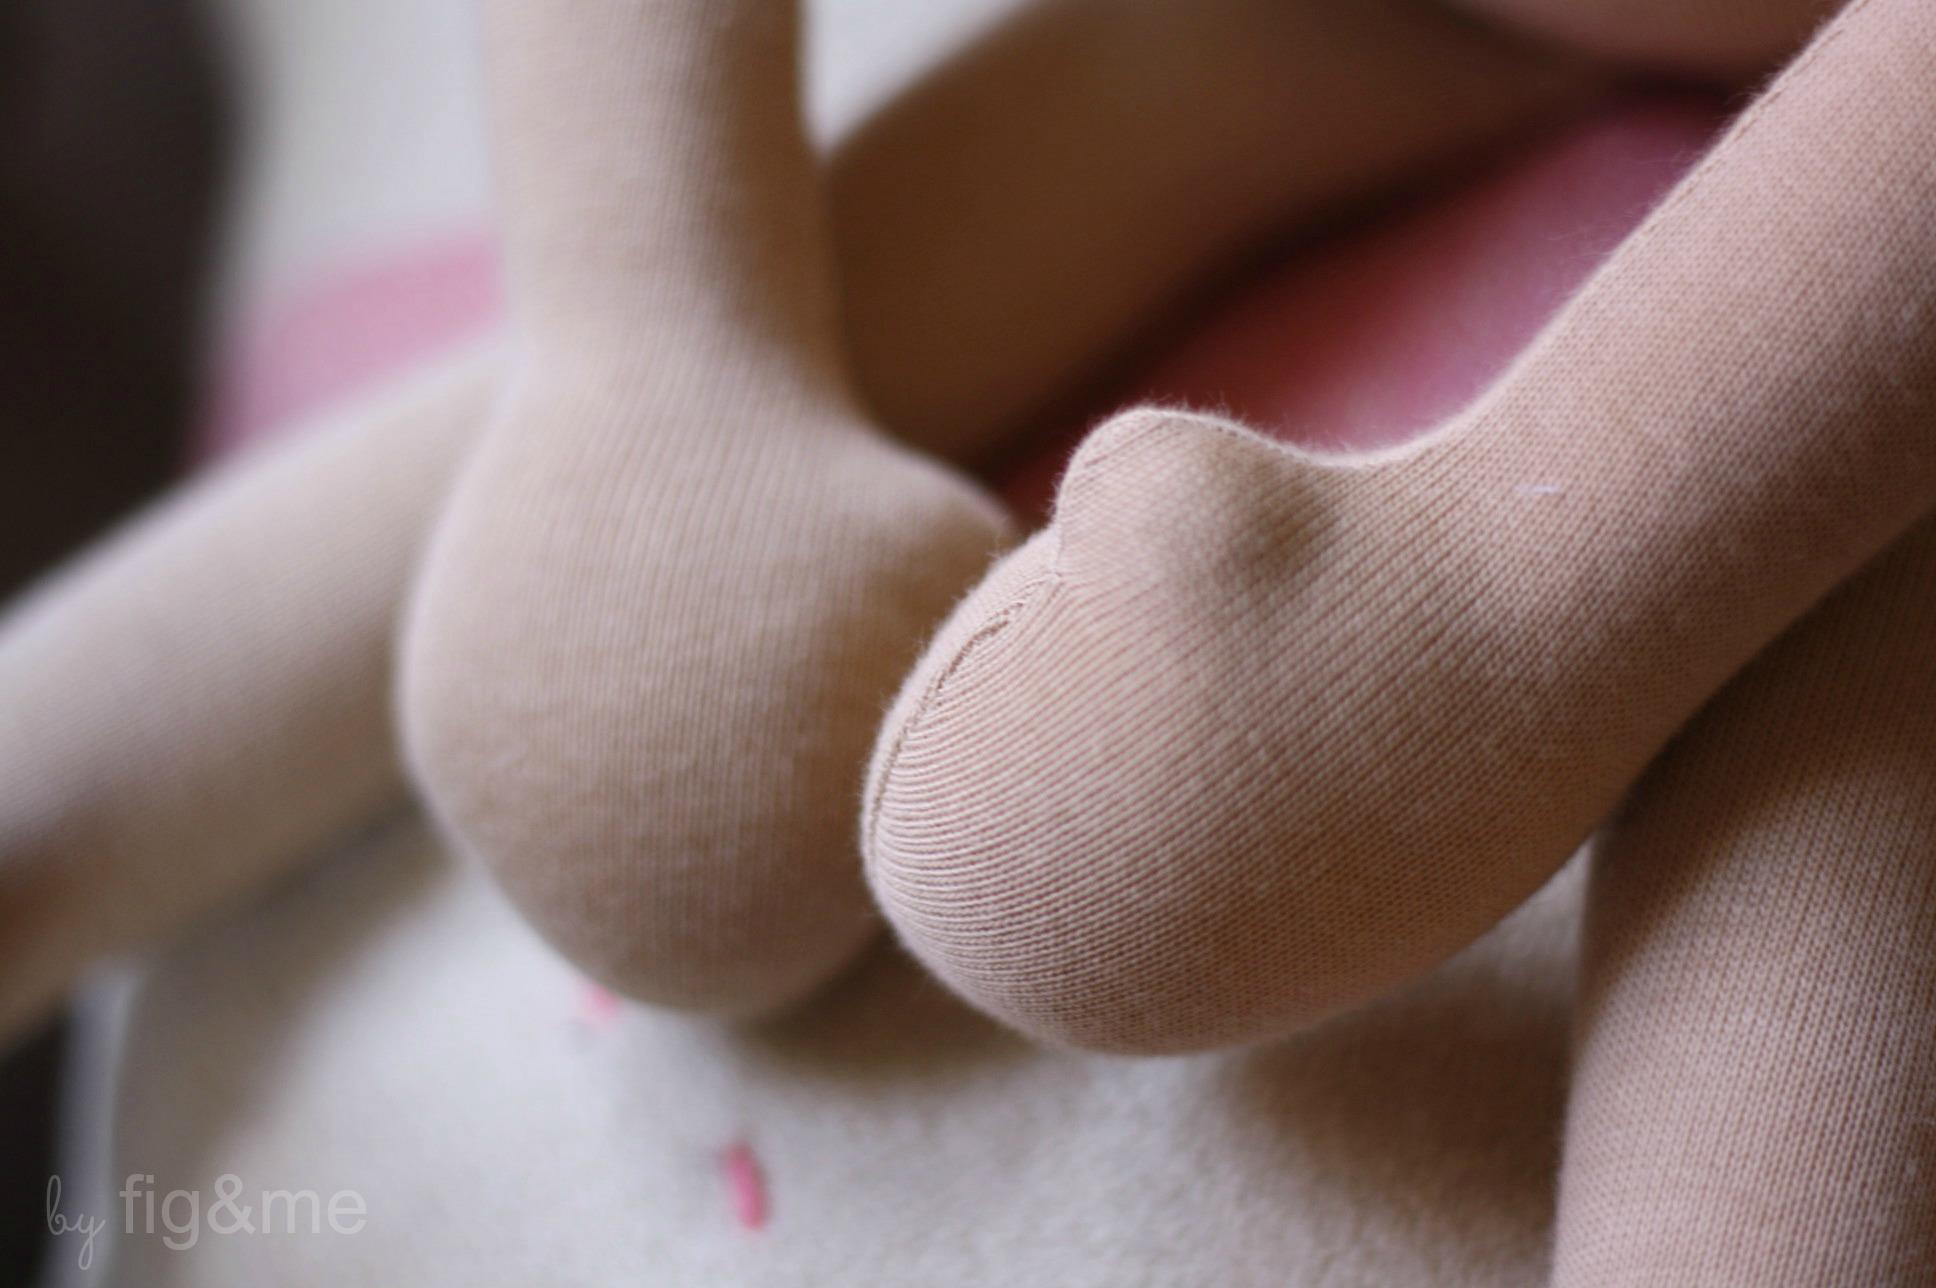 cloth-doll-hands-figandme.jpg